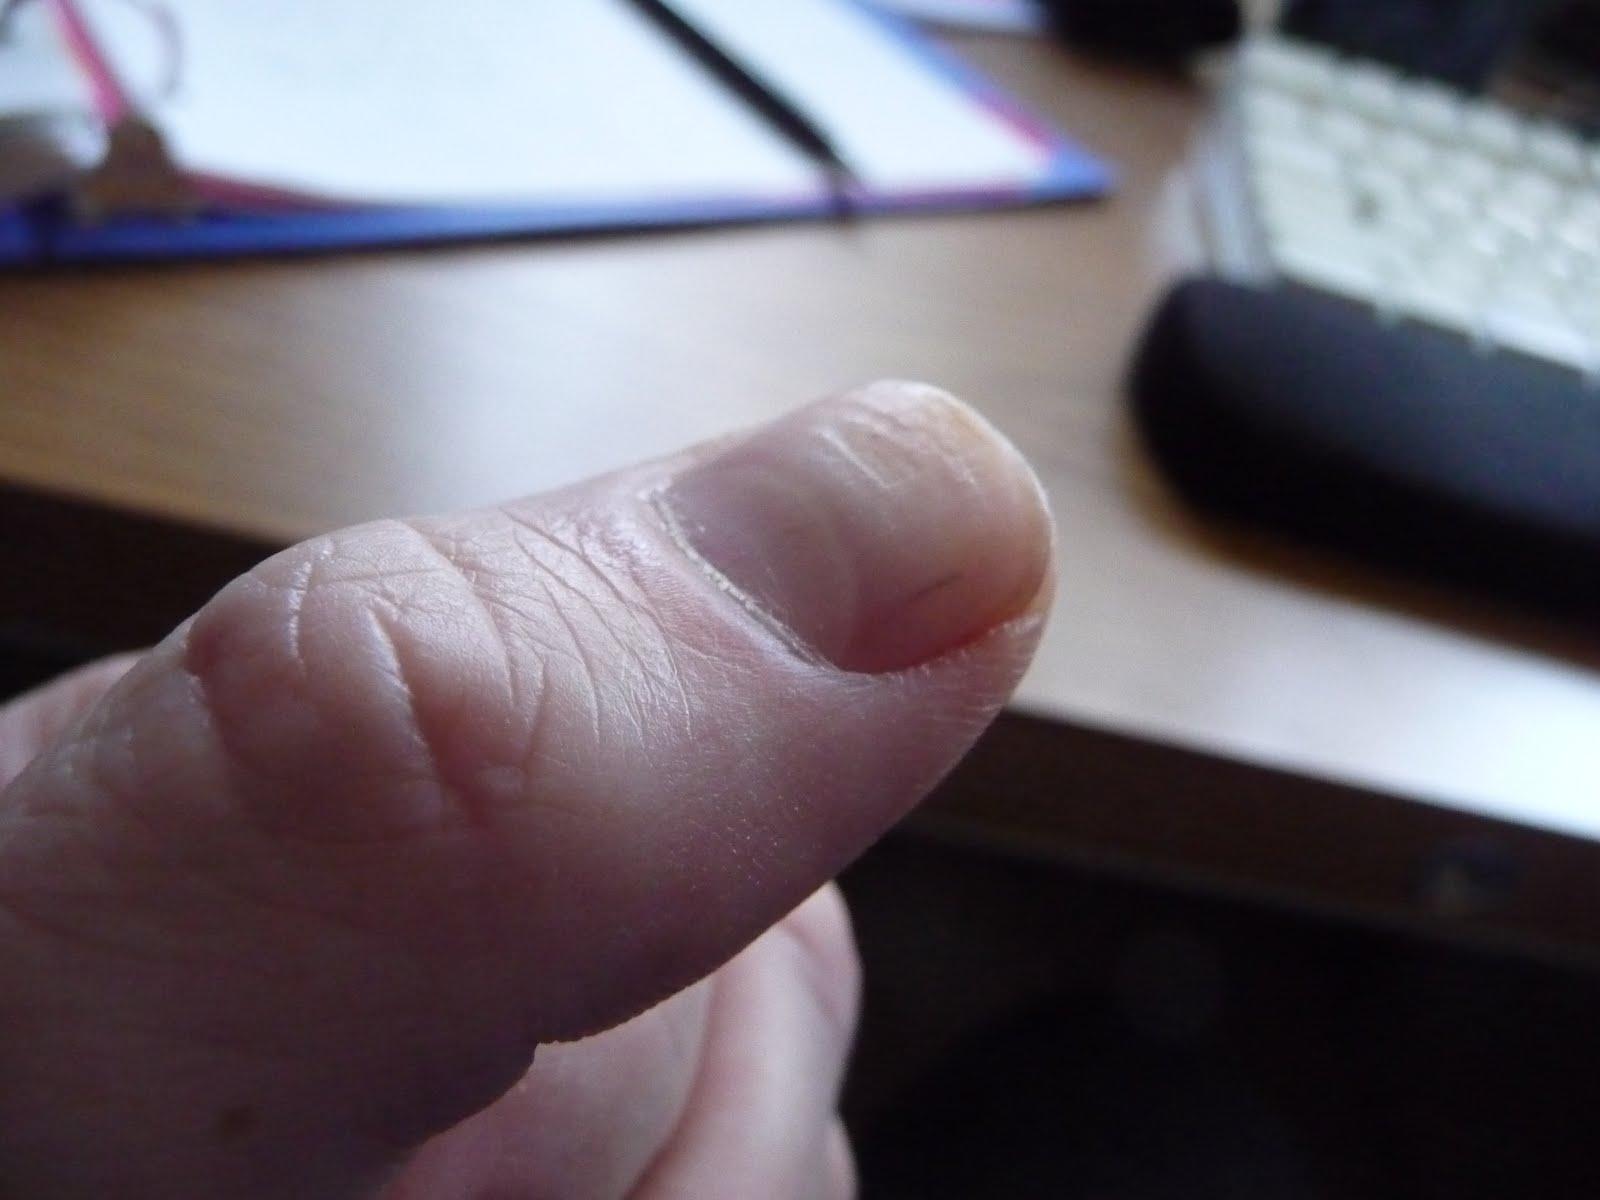 Deus ex machina: Lines and ridges on my fingernails - gone!